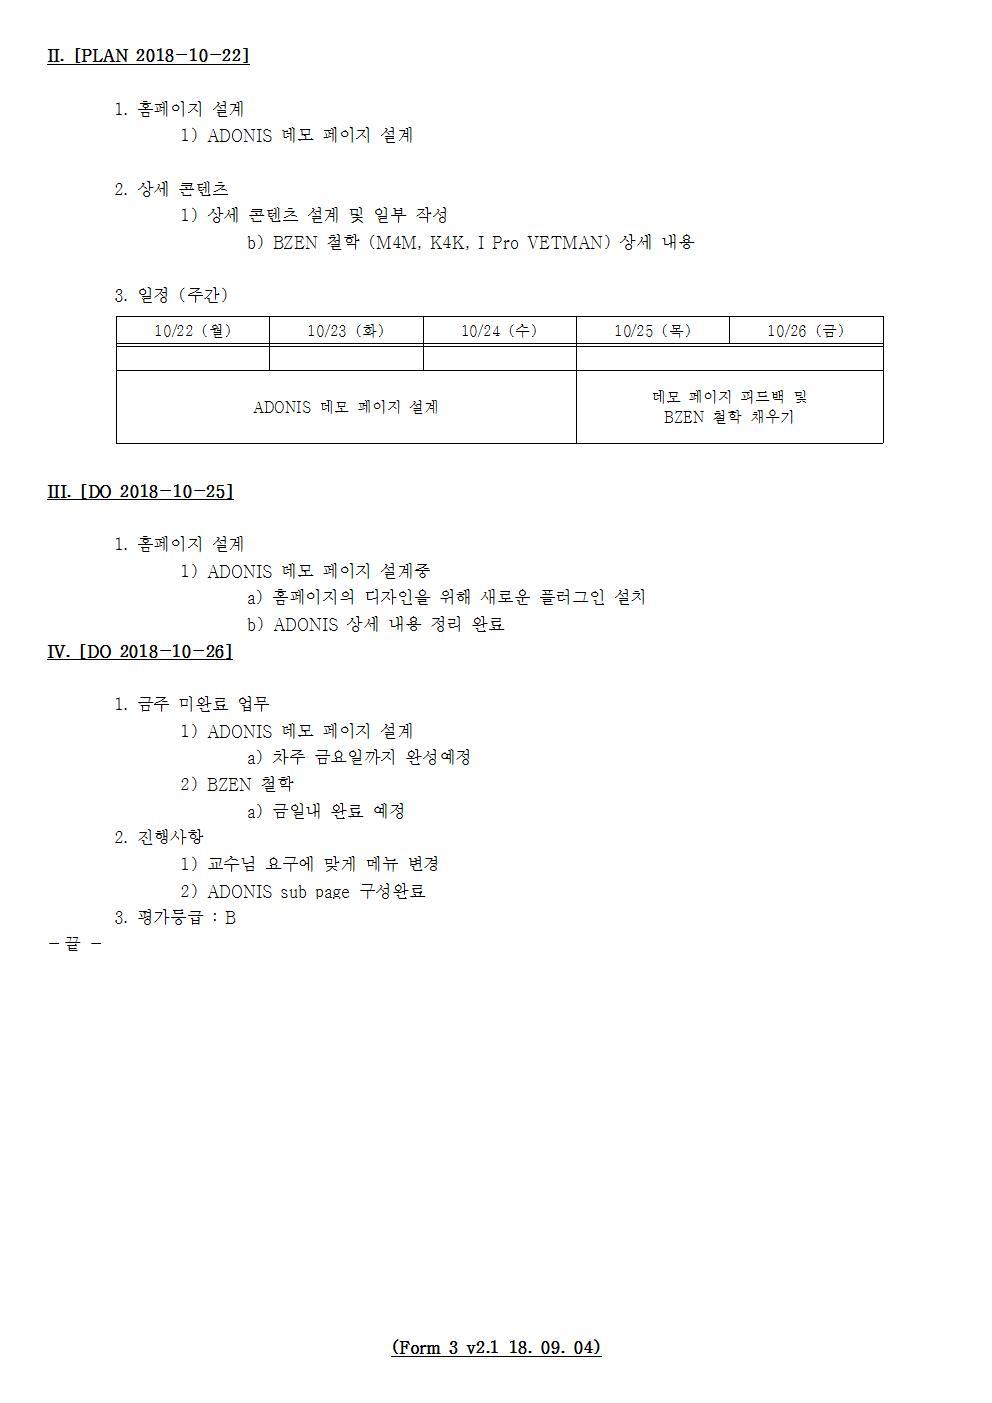 D-[18-047-BZ-07]-[BZEN HP v3.0]-[2018-10-26][HH]002.jpg